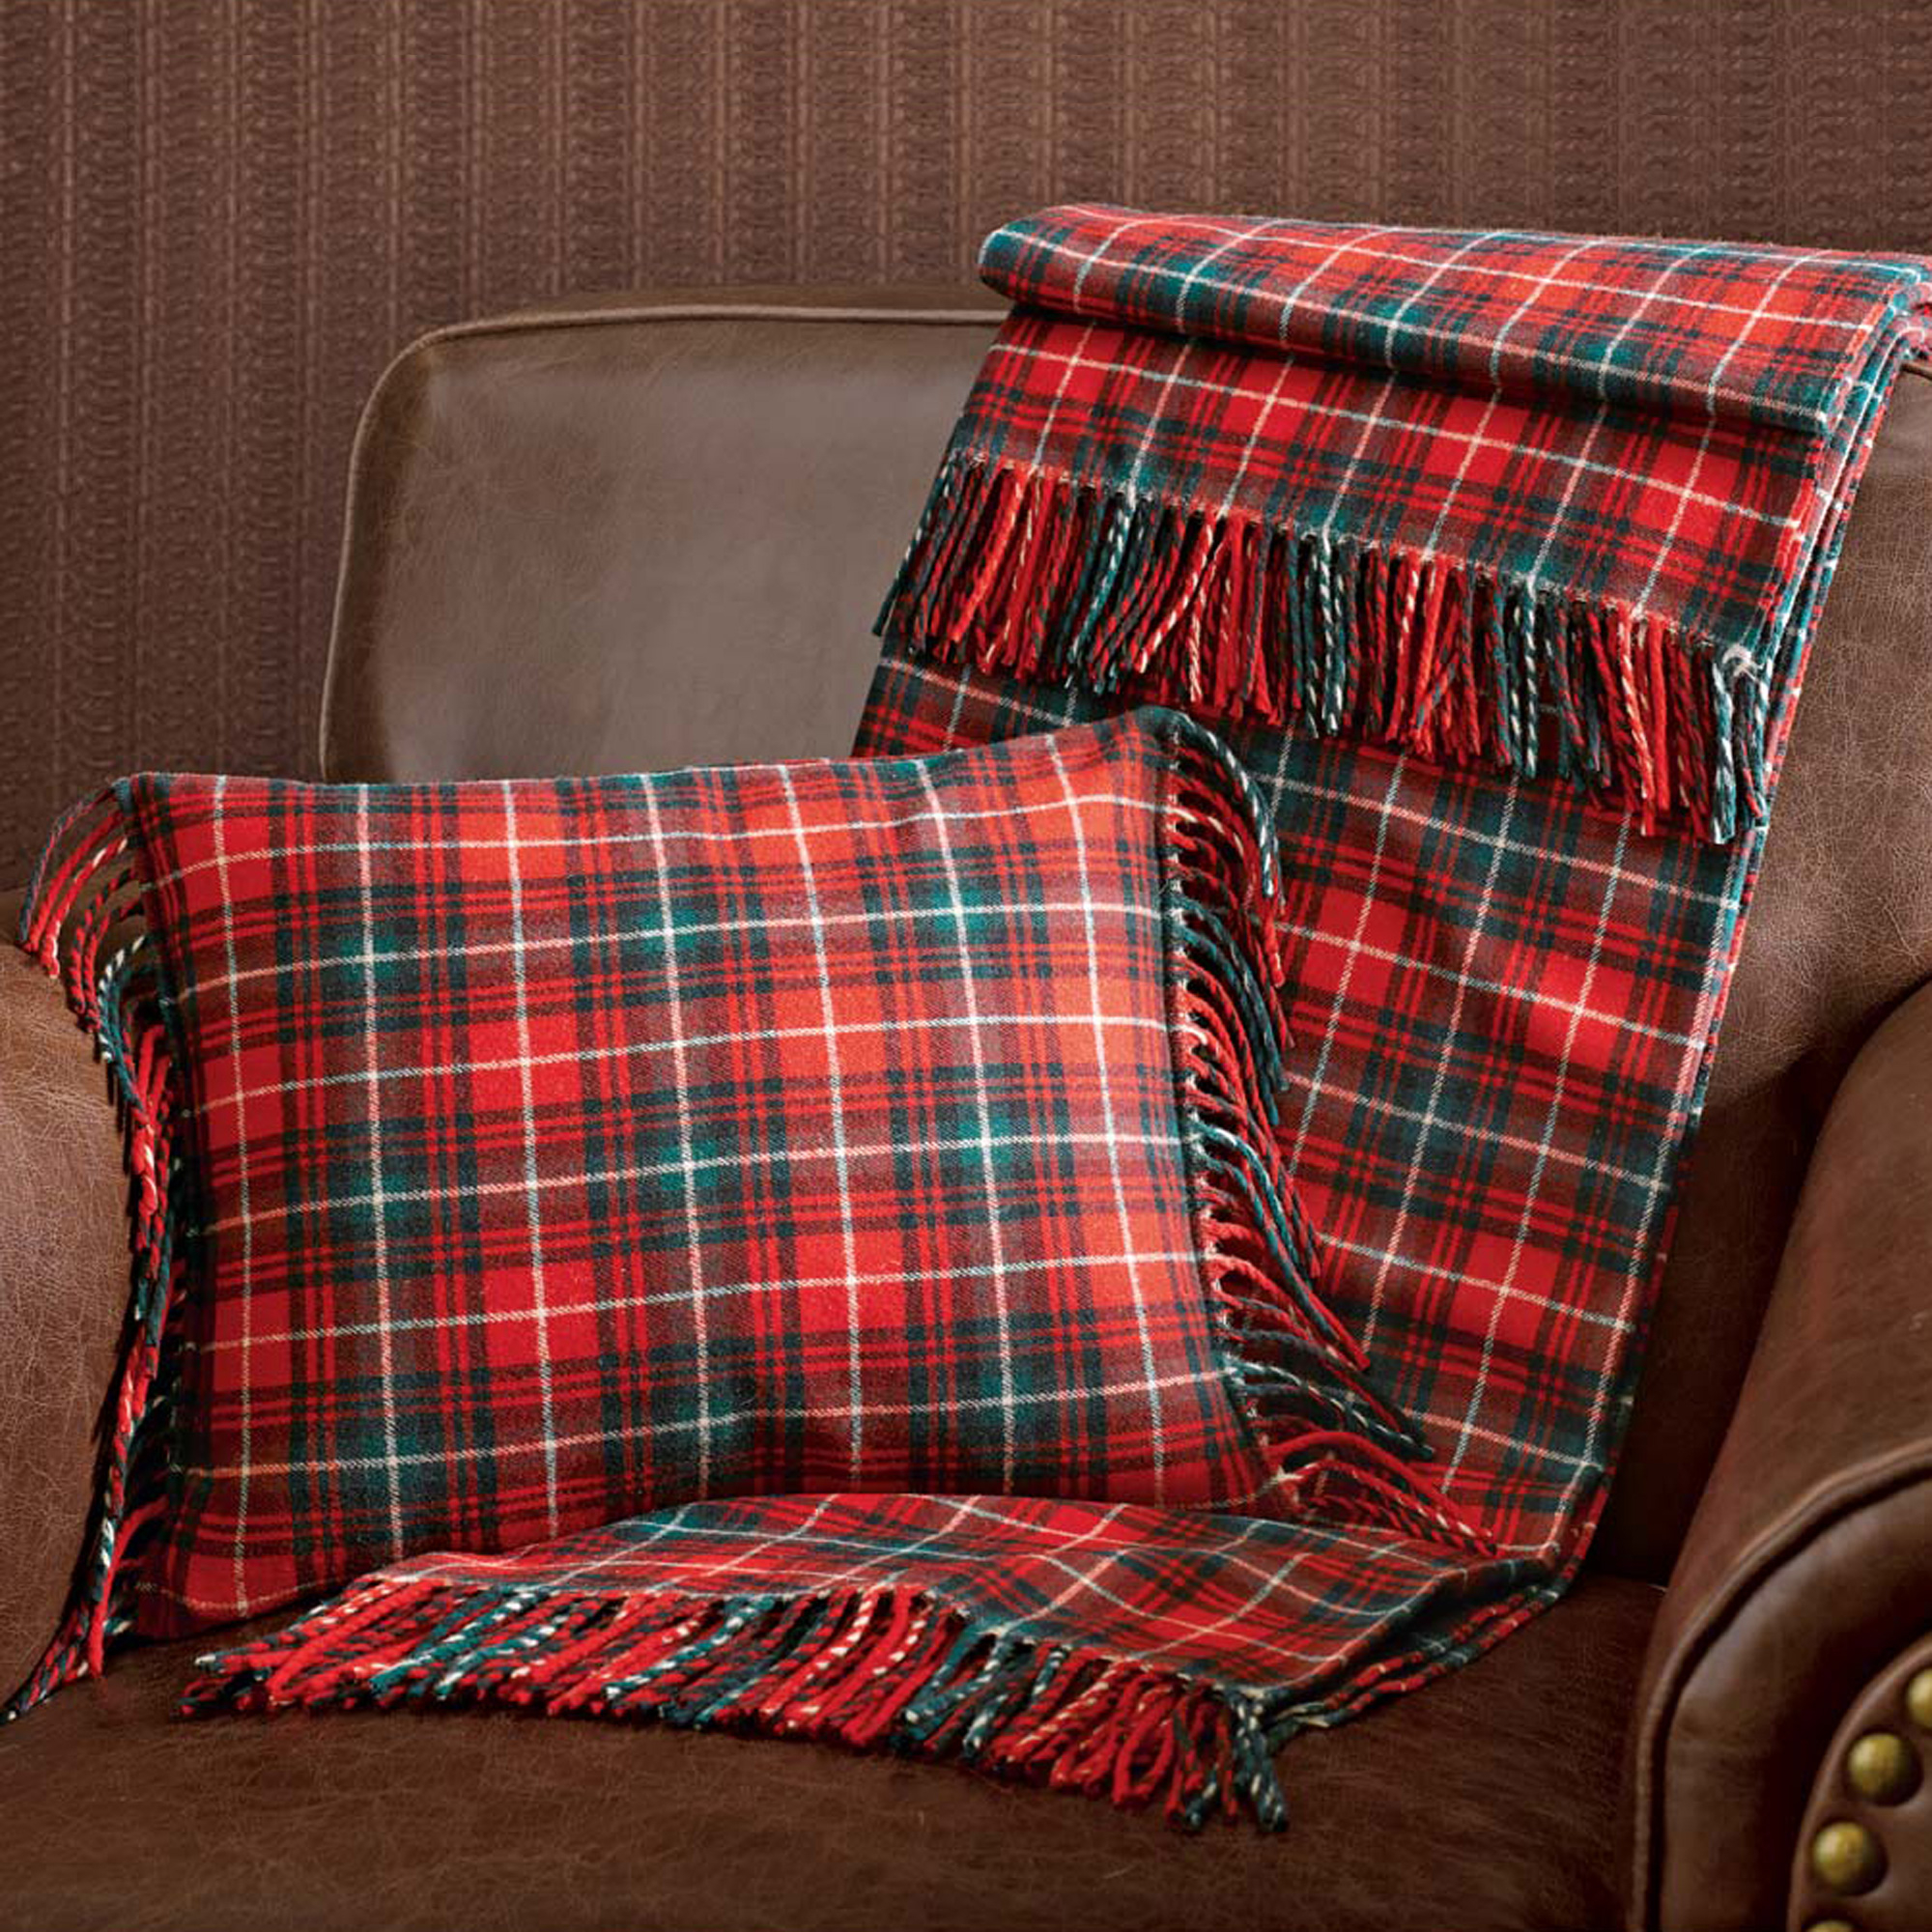 Throw Pillows Home : Highlands Pillow & Throw Gump s